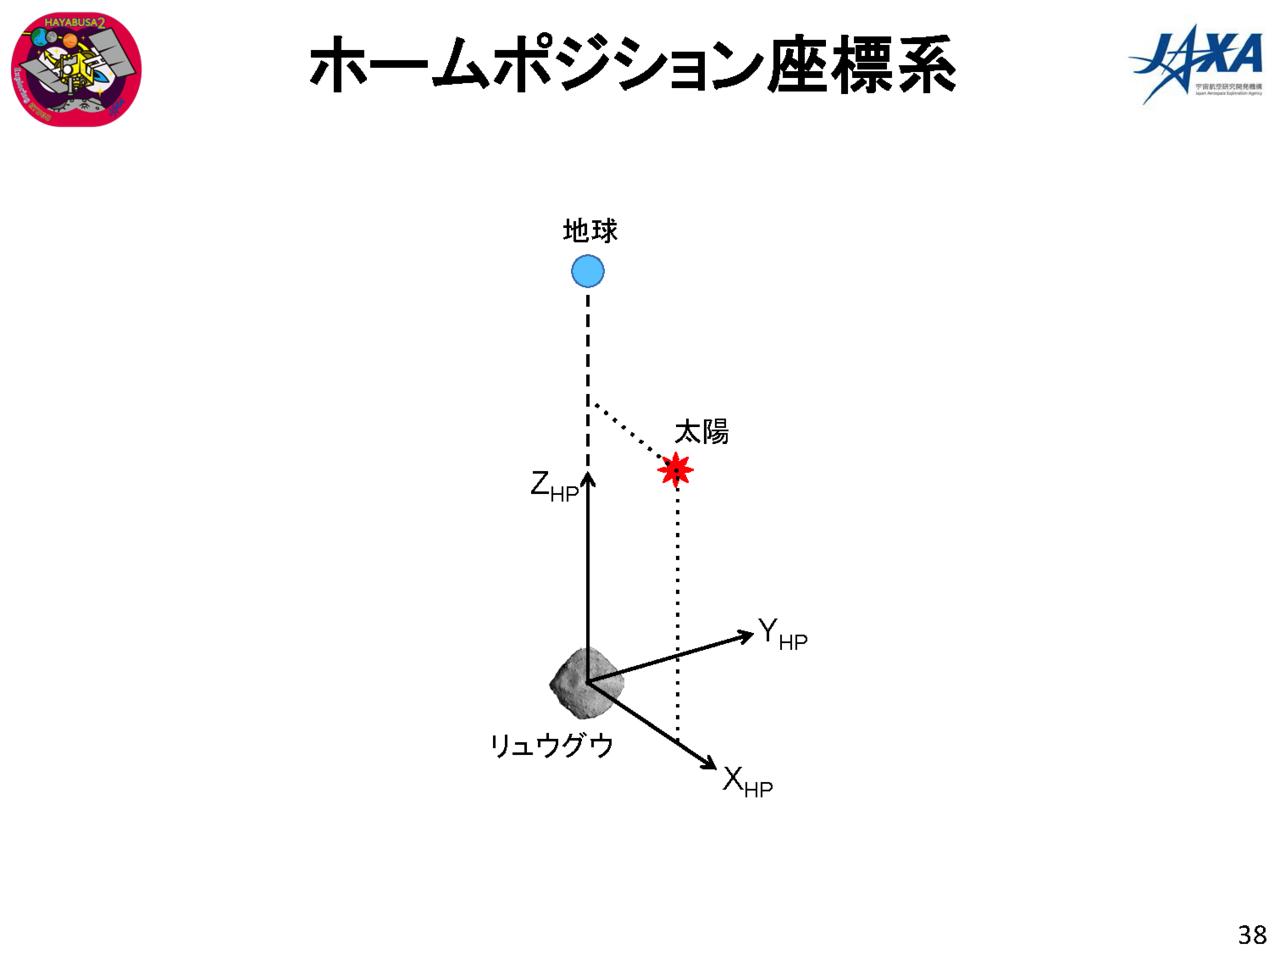 f:id:Imamura:20180802145958p:plain